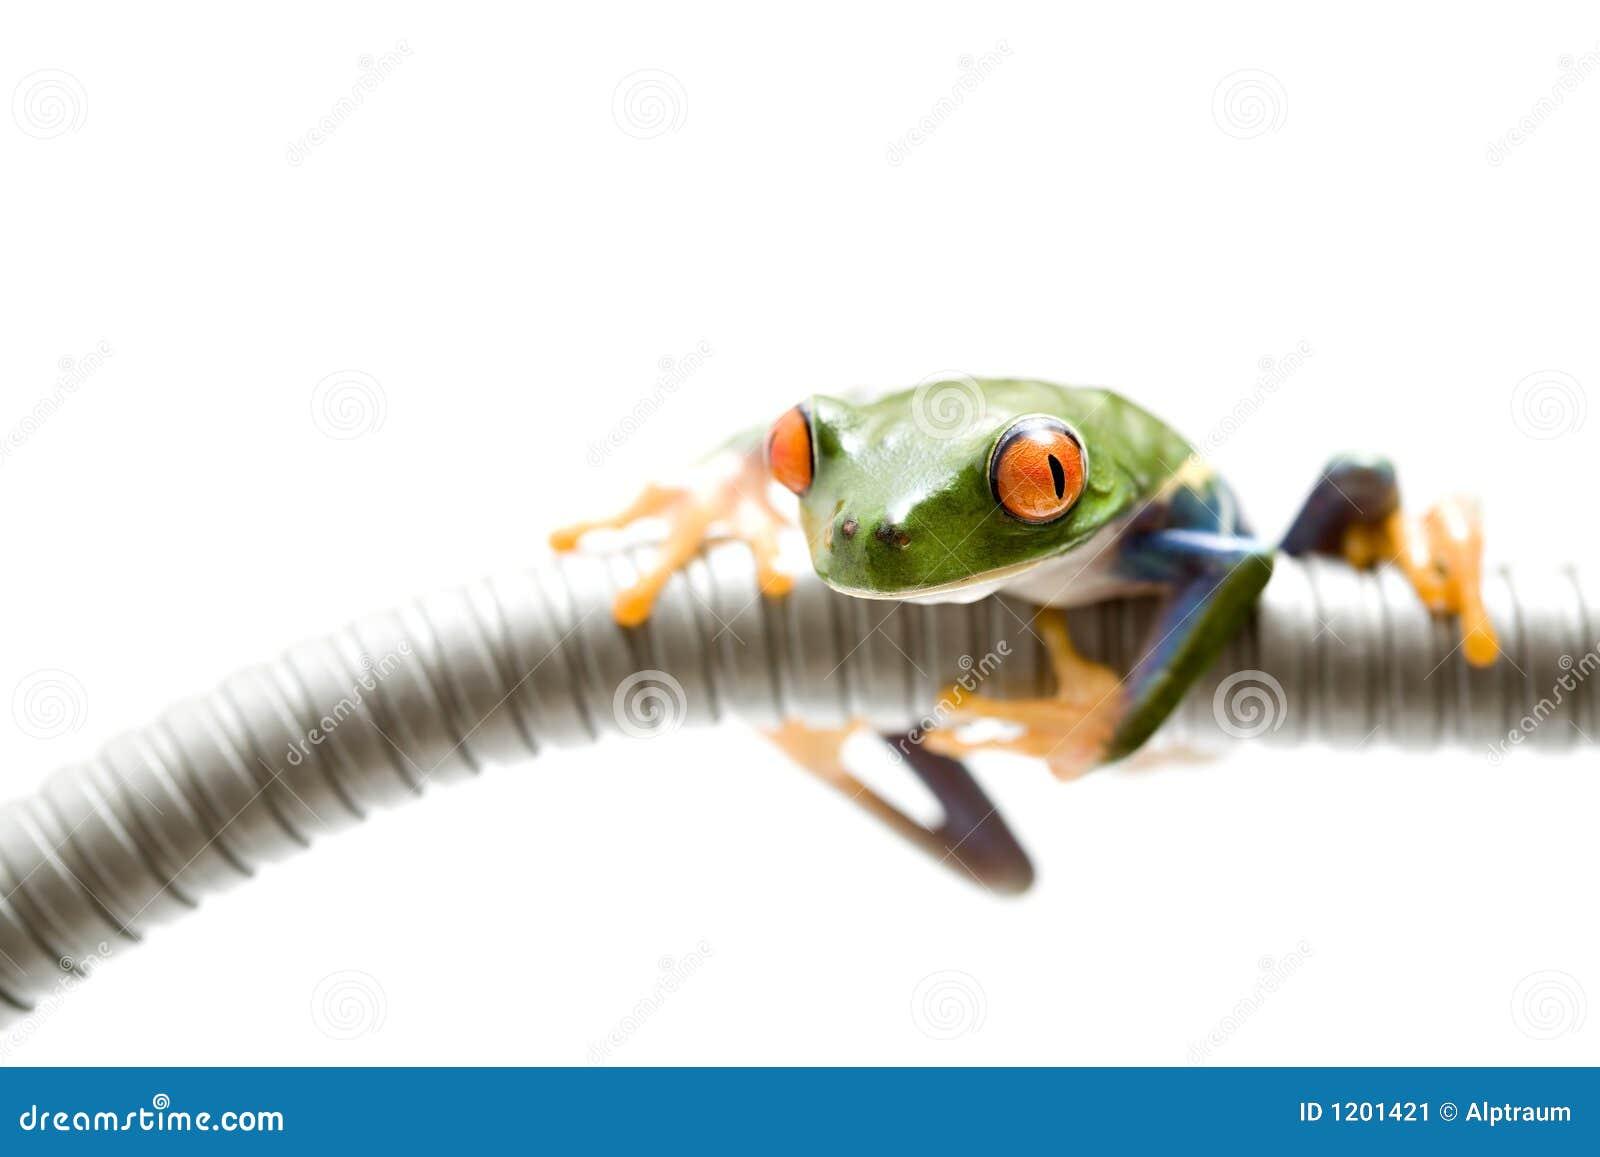 Frog climbing around